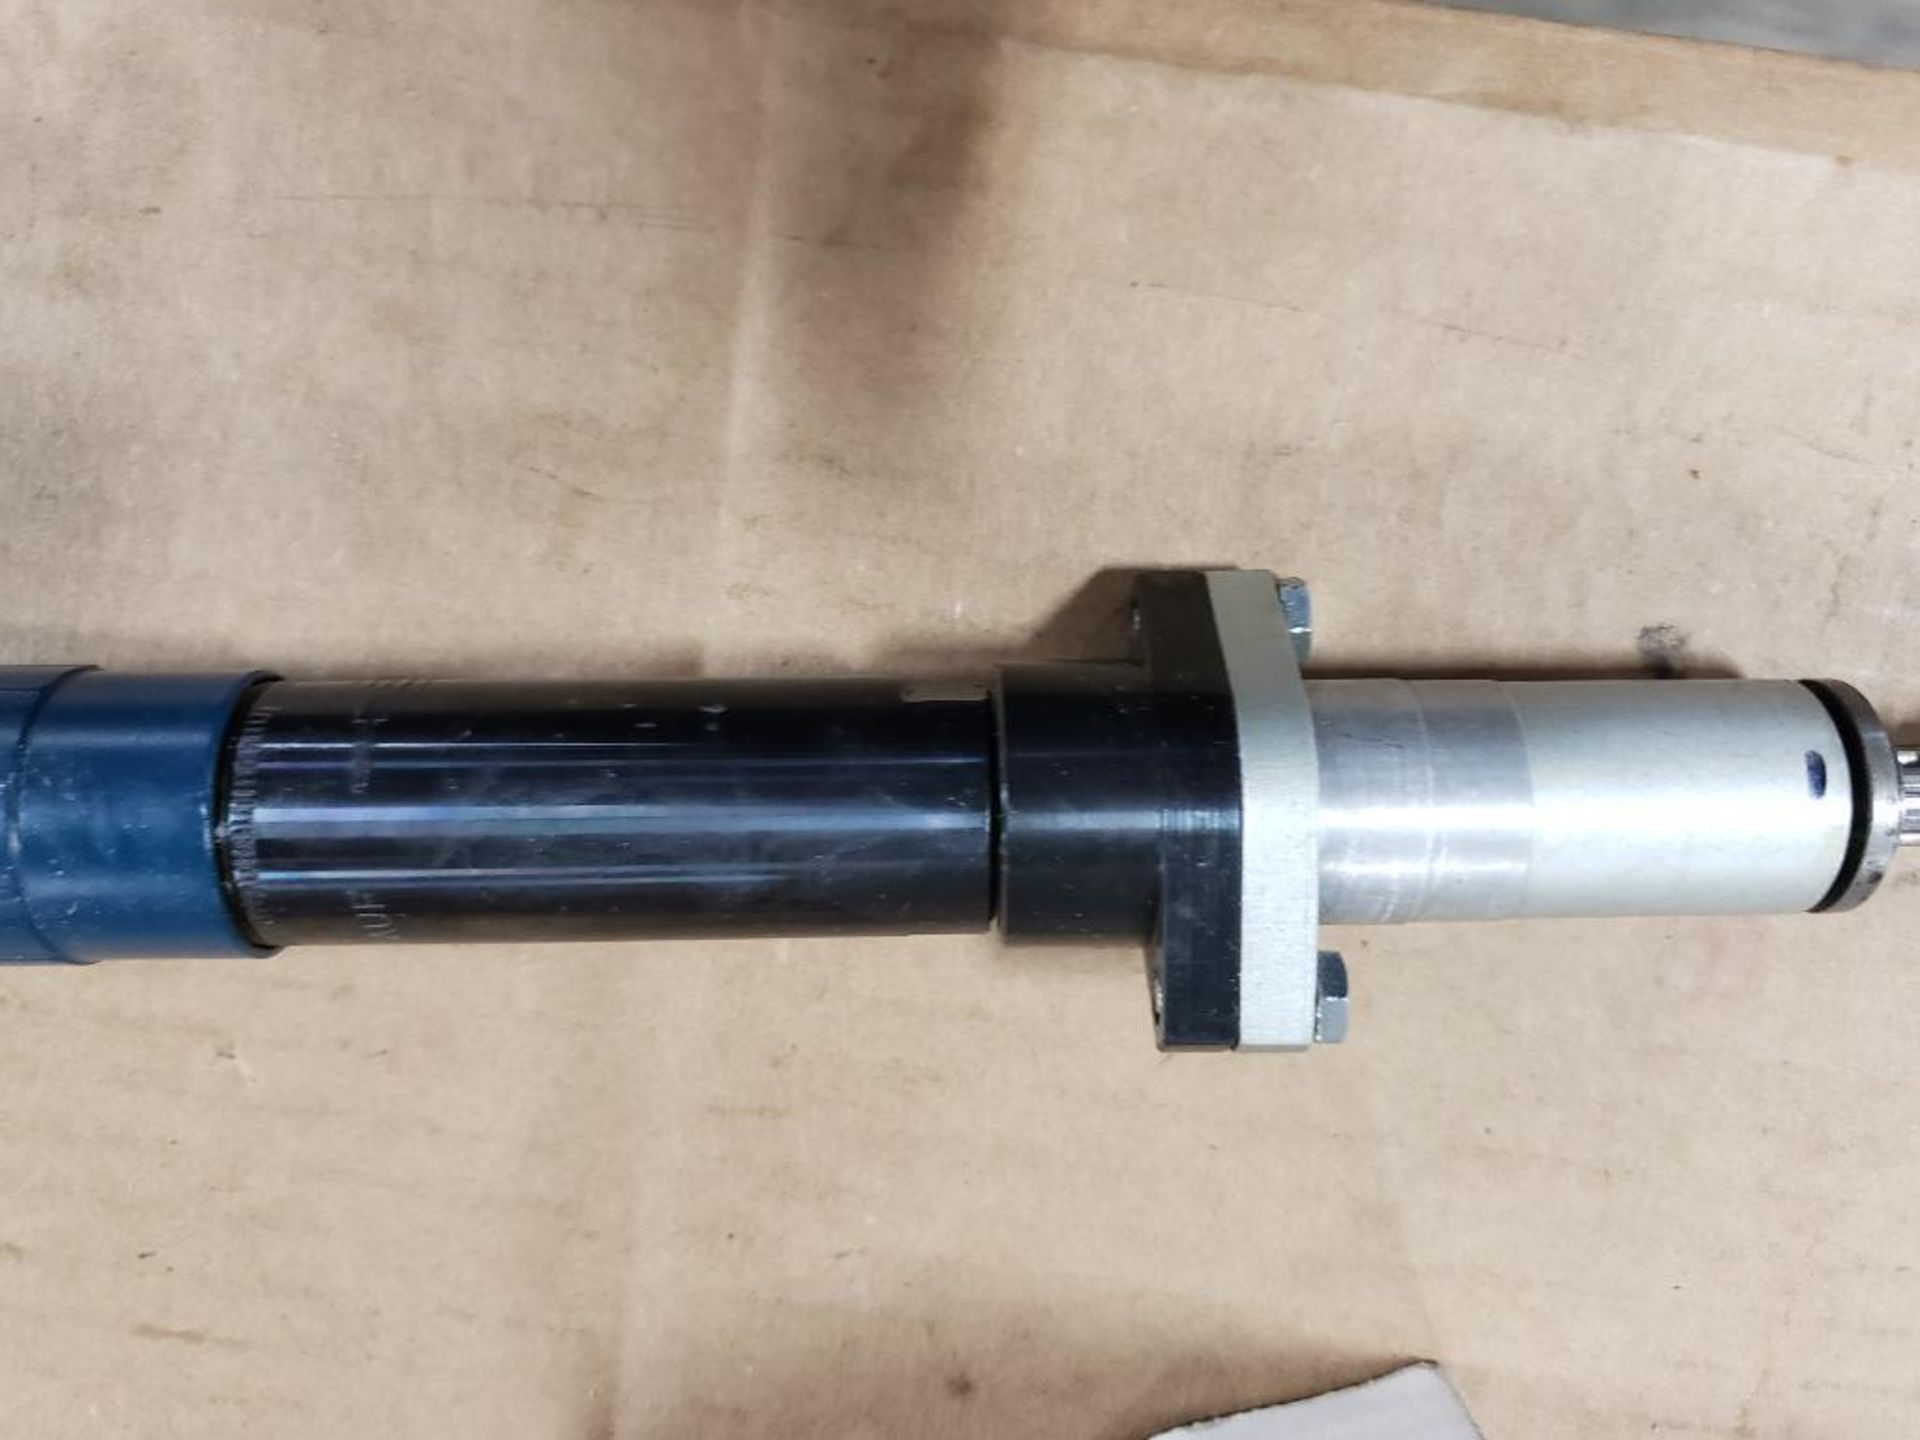 Bosch 0-605-PE0-310 Nutrunner. - Image 8 of 9